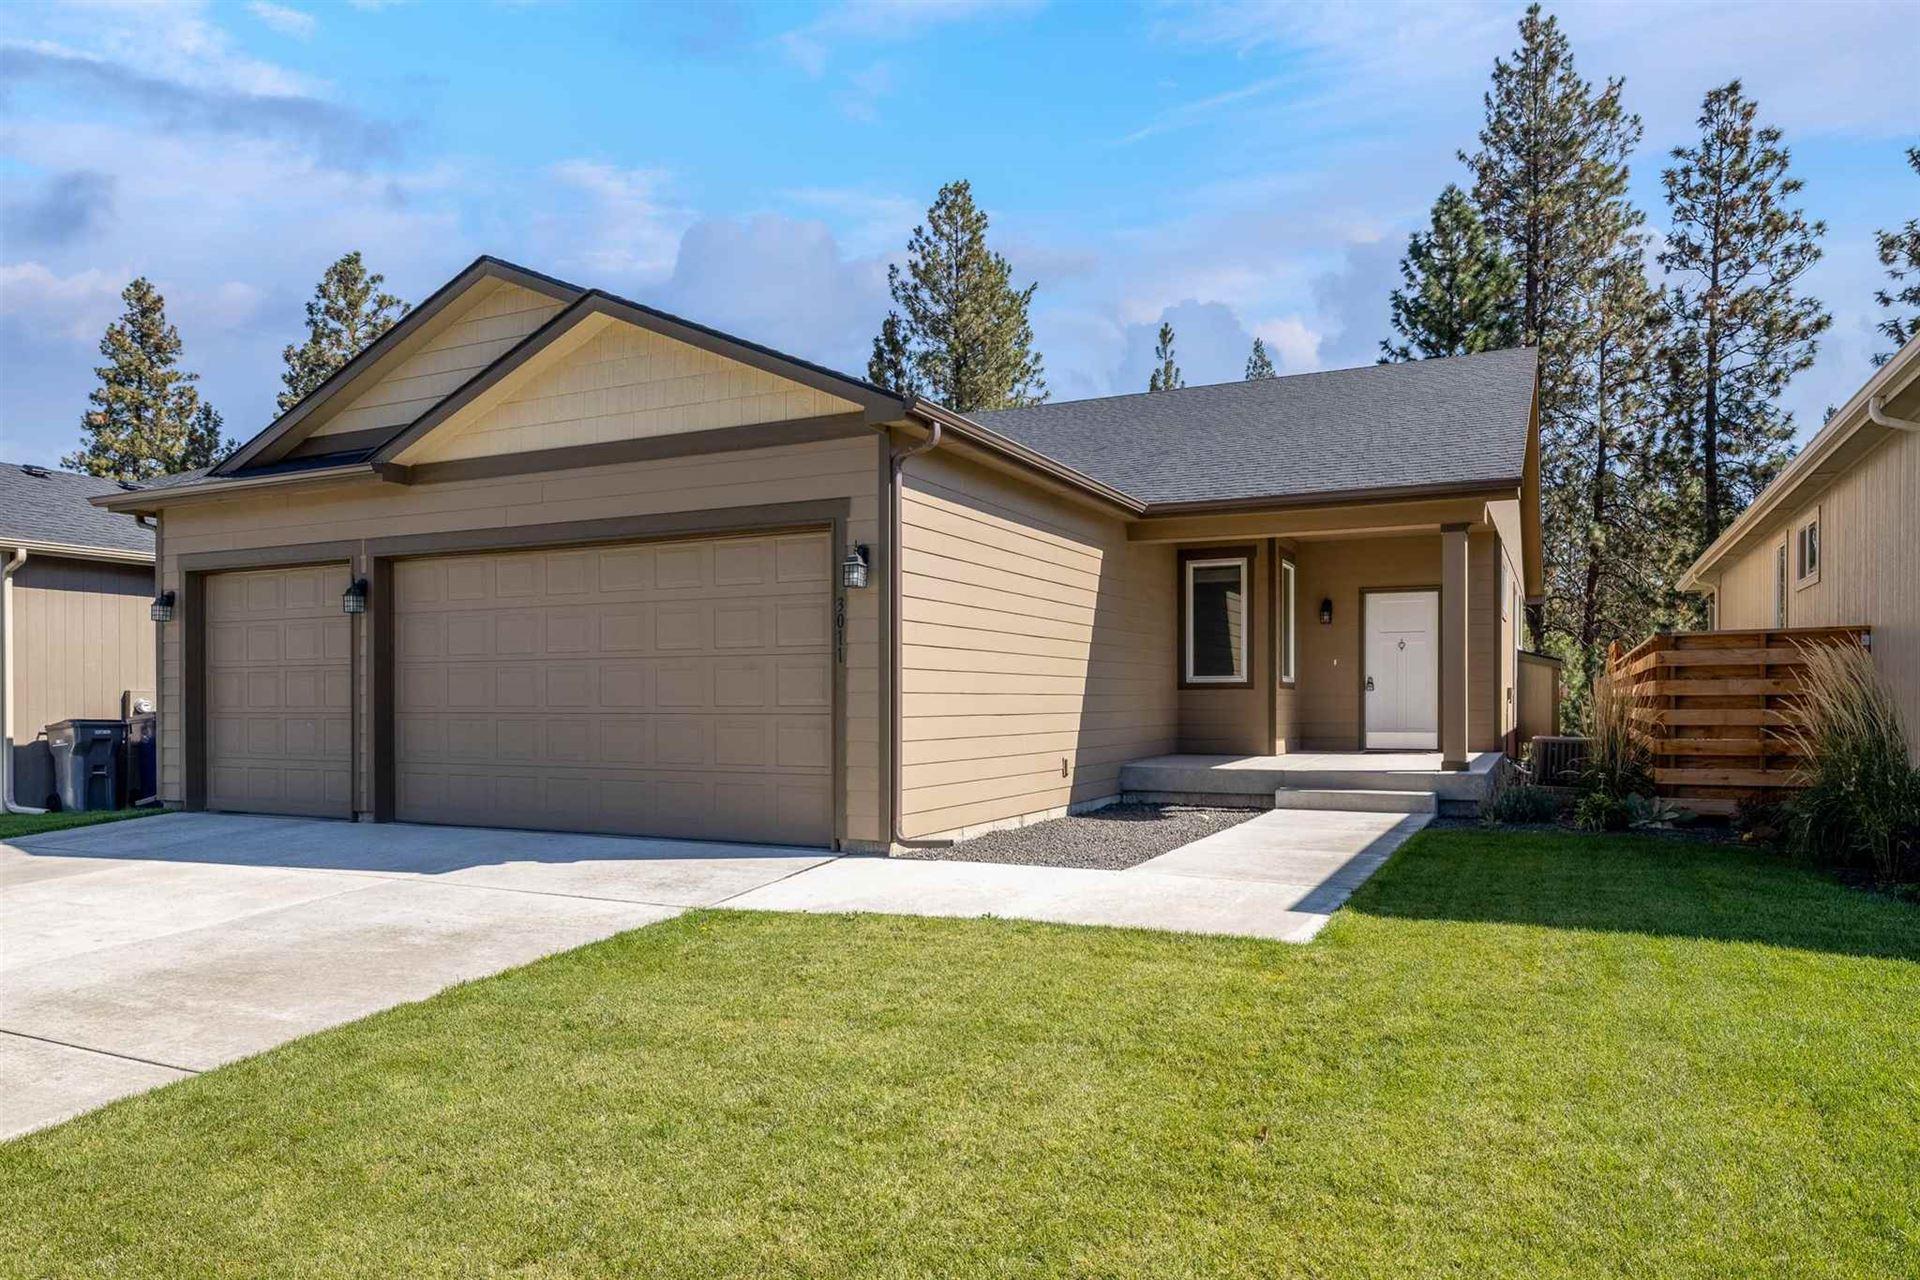 Photo of 3011 S Custer Ln, Spokane, WA 99223 (MLS # 202122555)